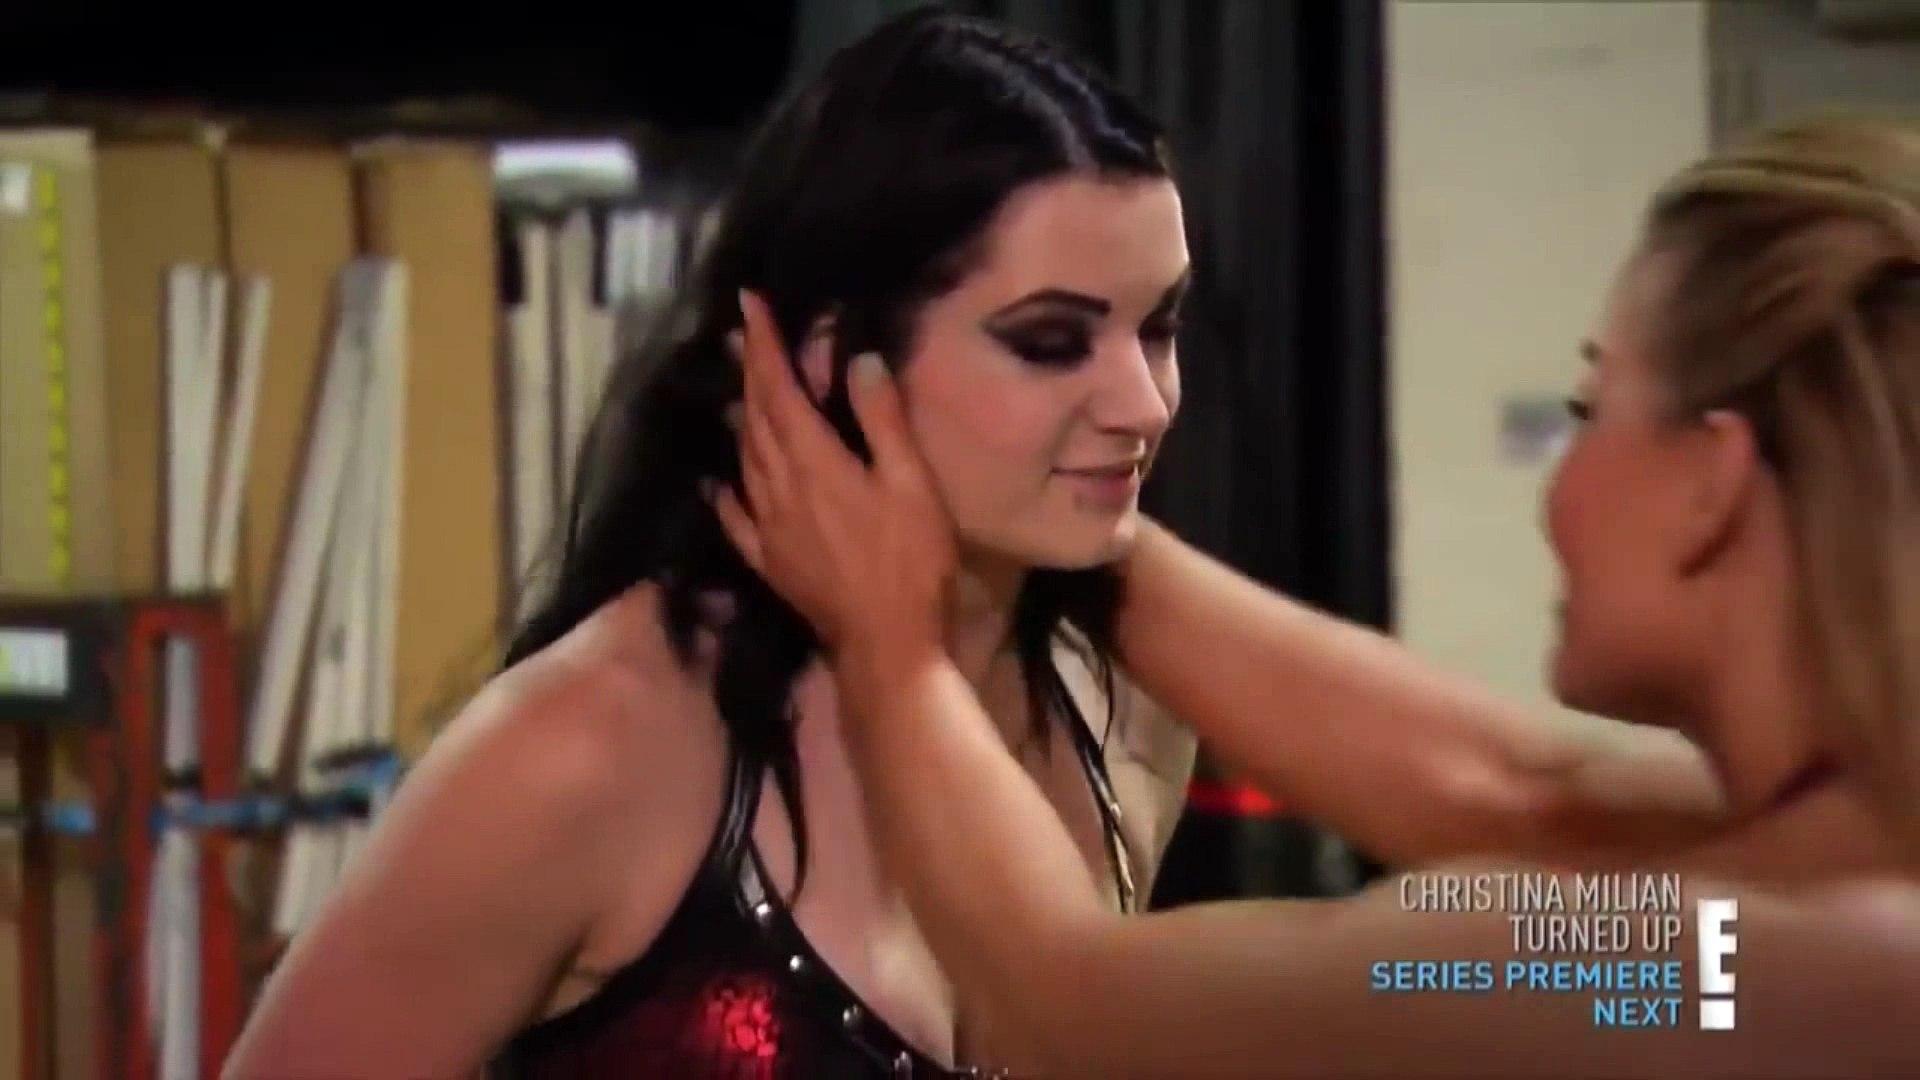 Tits wwe paige WWE: Family,